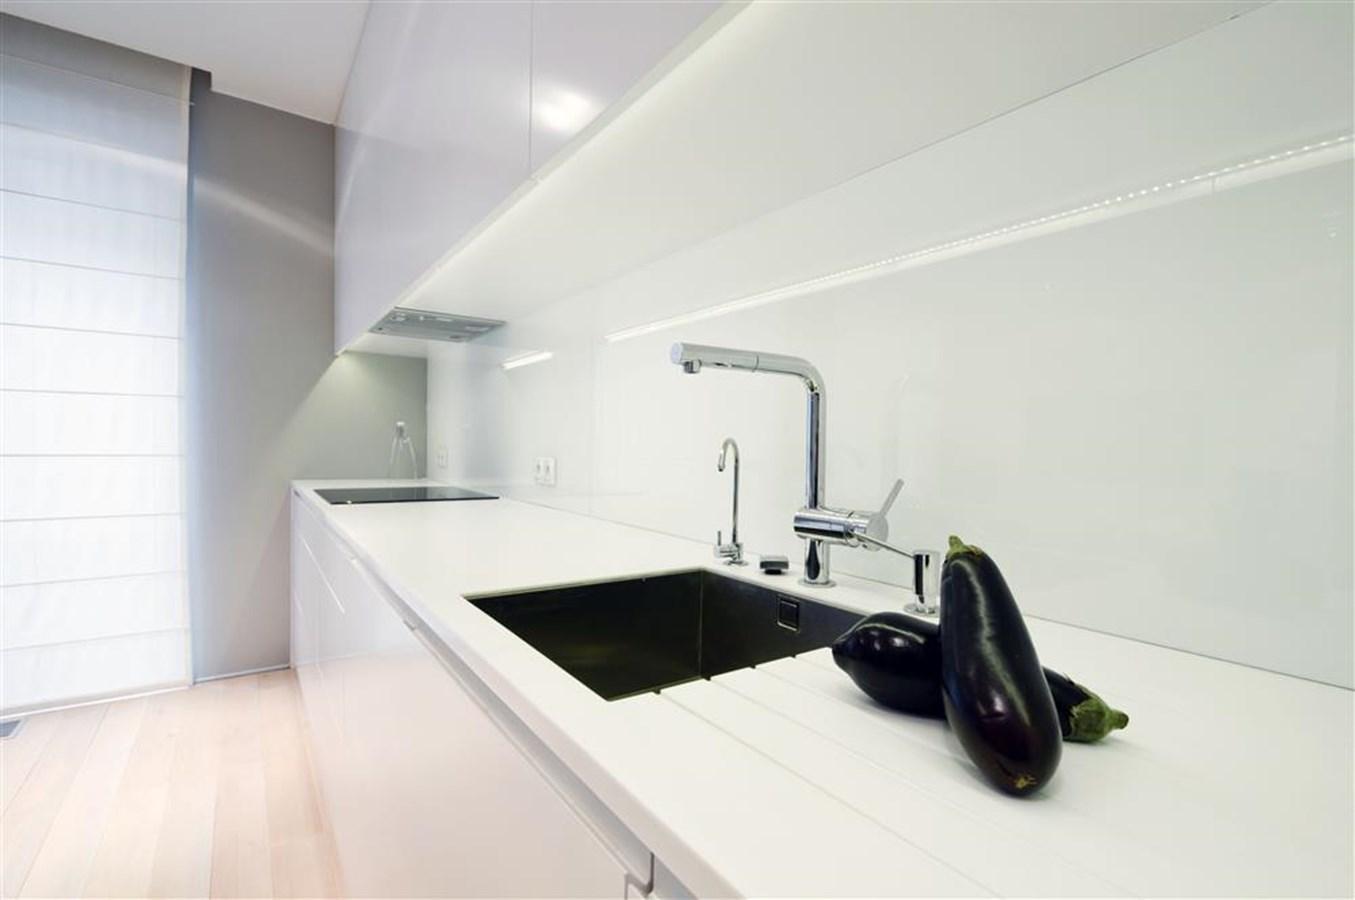 Otwarta kuchnia w bieli hola design homesquare - Projekt Modernistycznej Kuchni